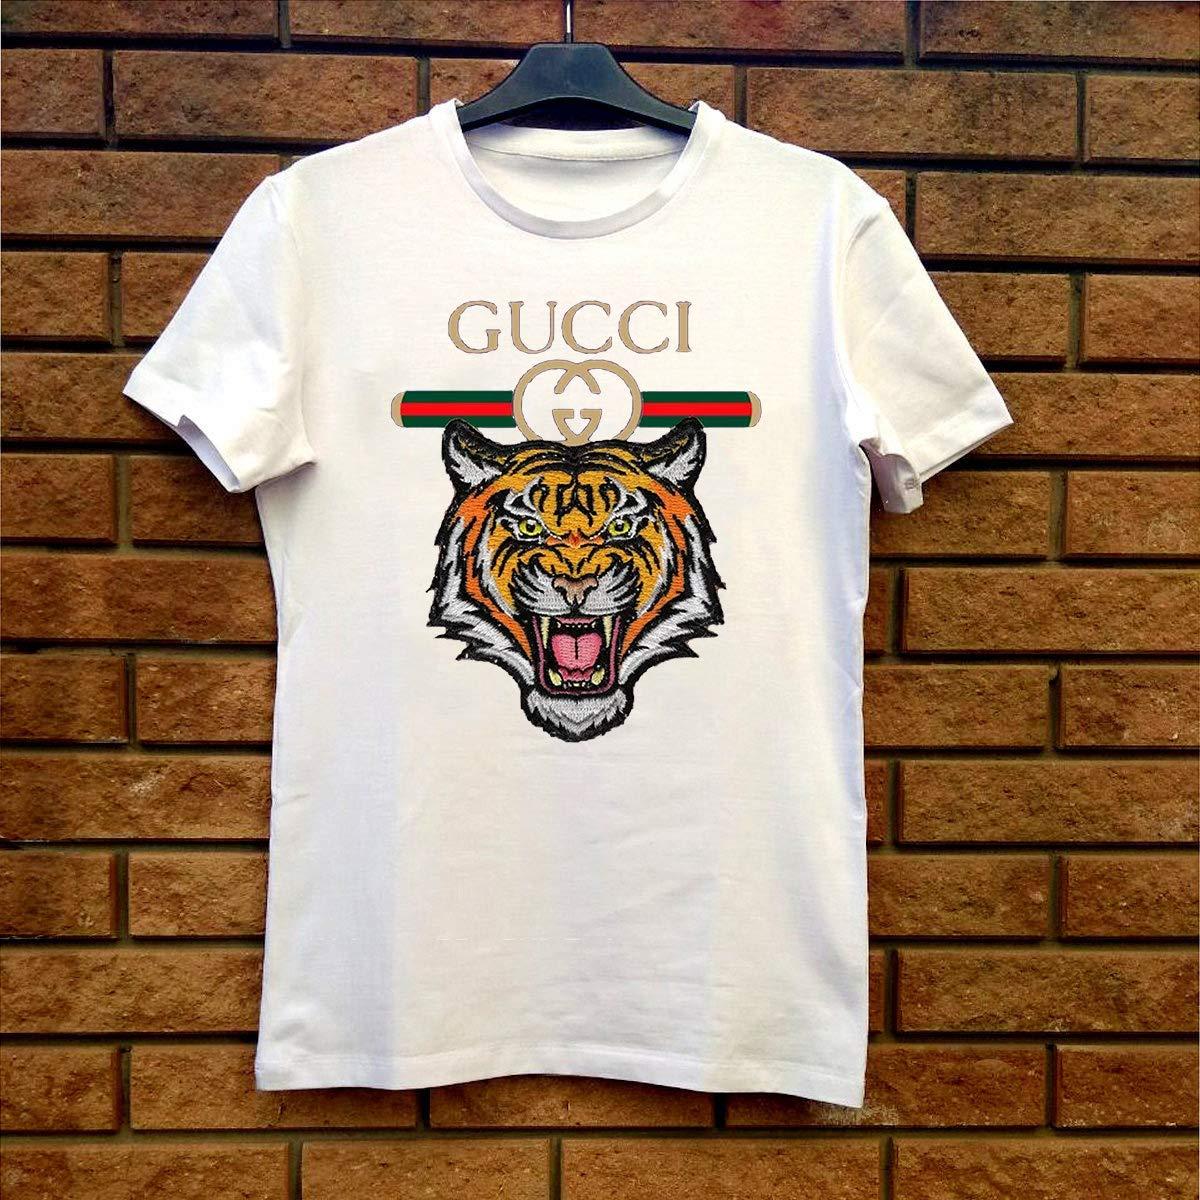 05871a24 Amazon.com: Gucci Vintage Shirt Tiger For Men Women White Shirt ...